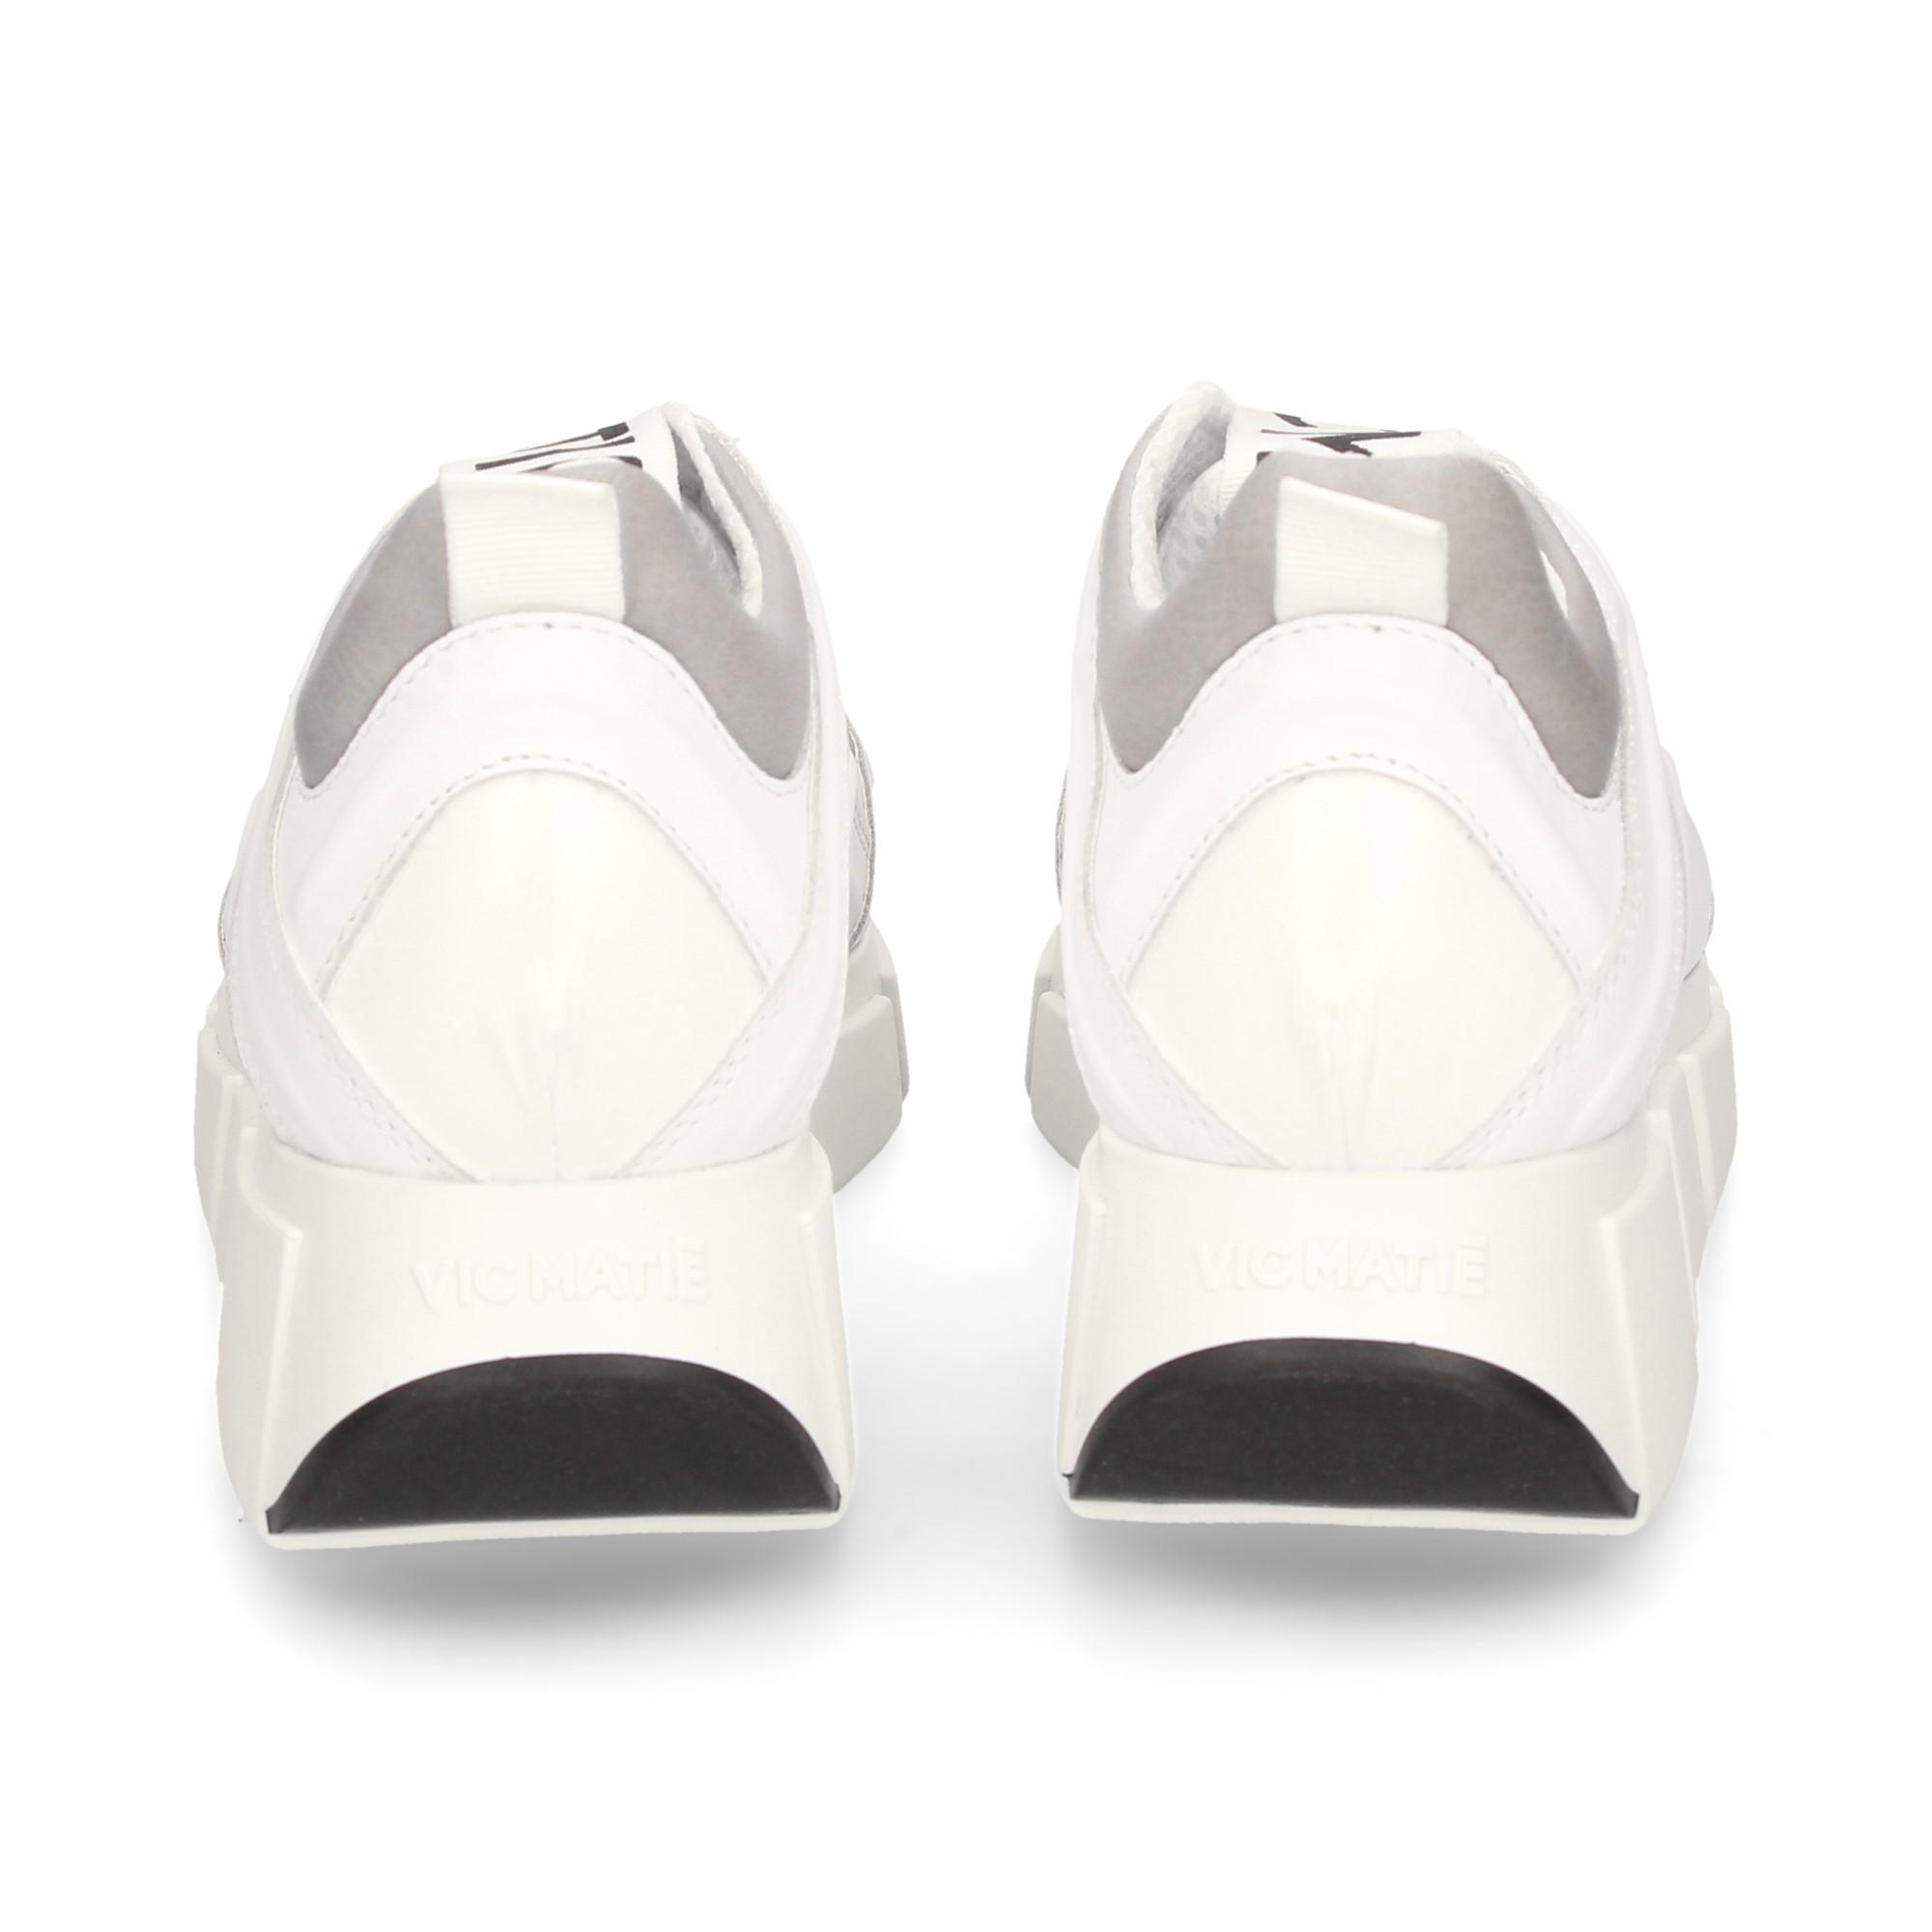 deportivo-plataf-piel-nylon-blanco